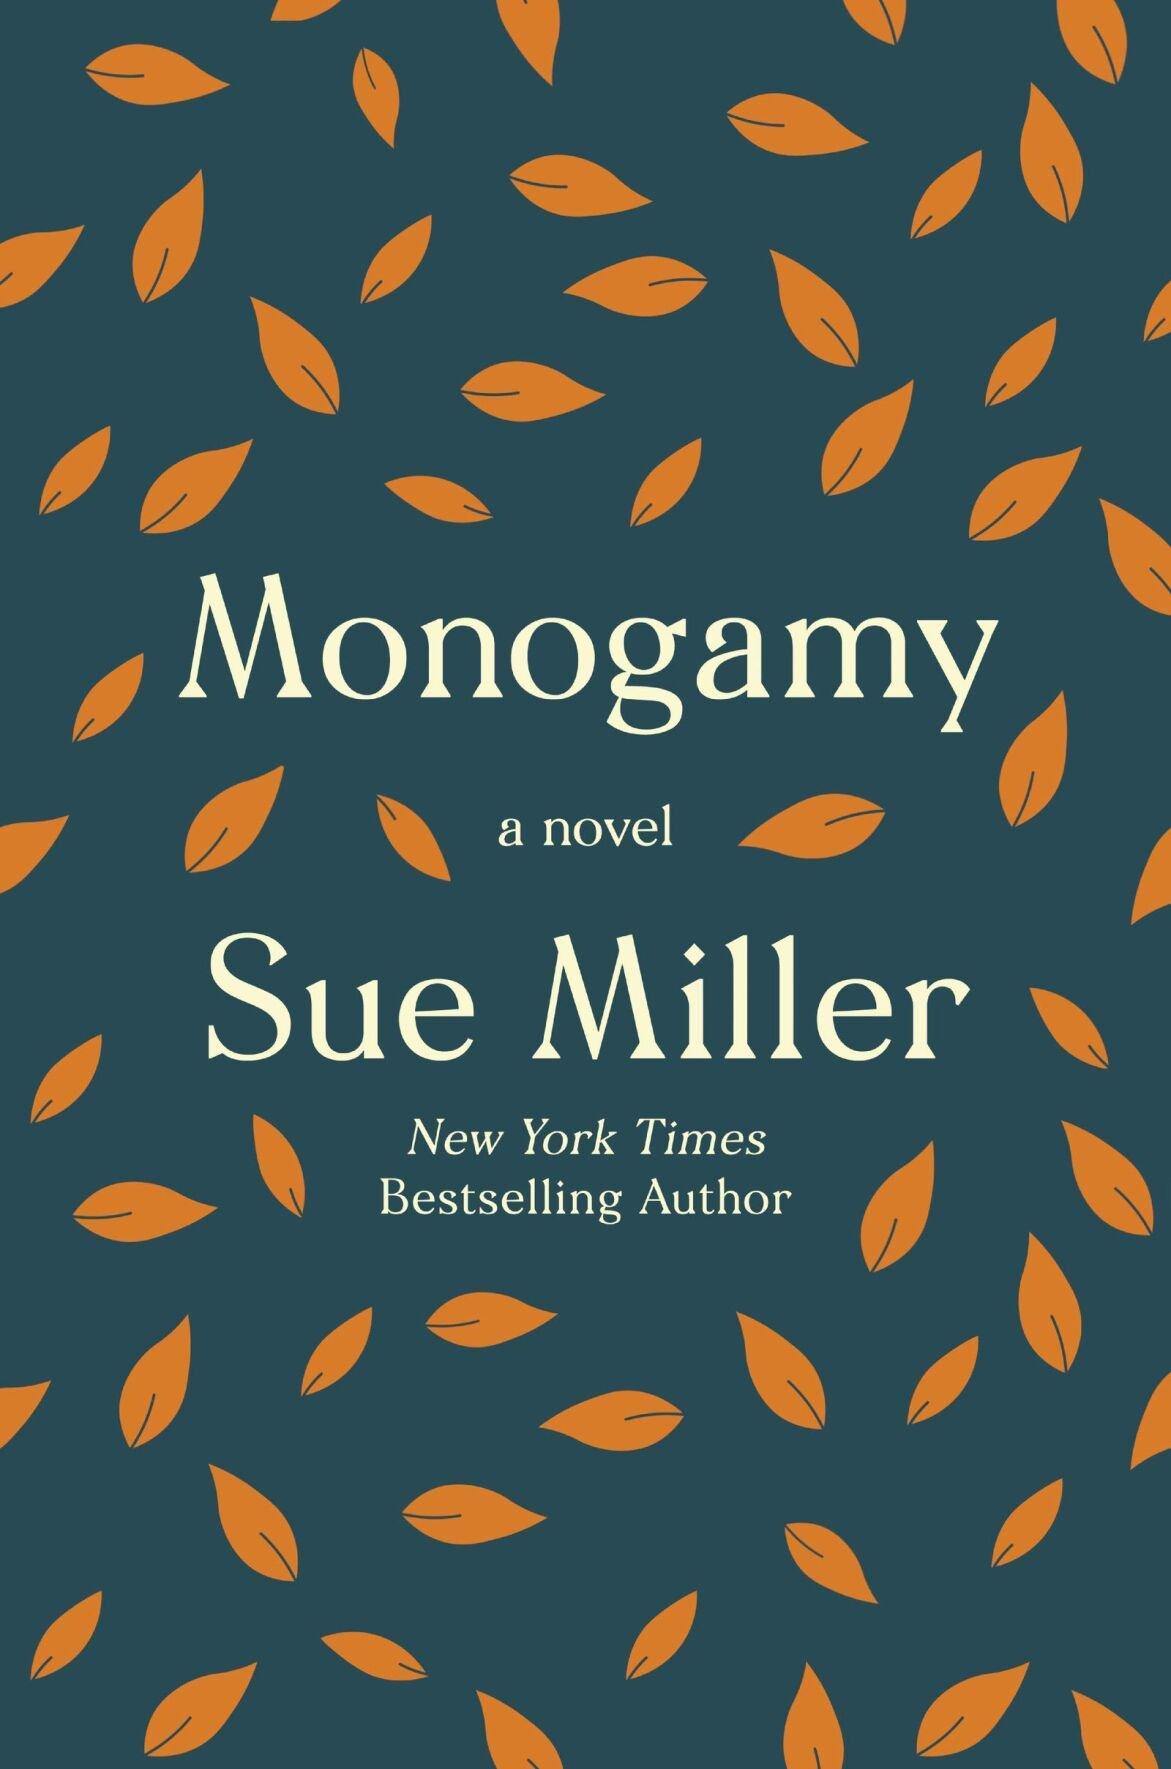 monogamy.jpg